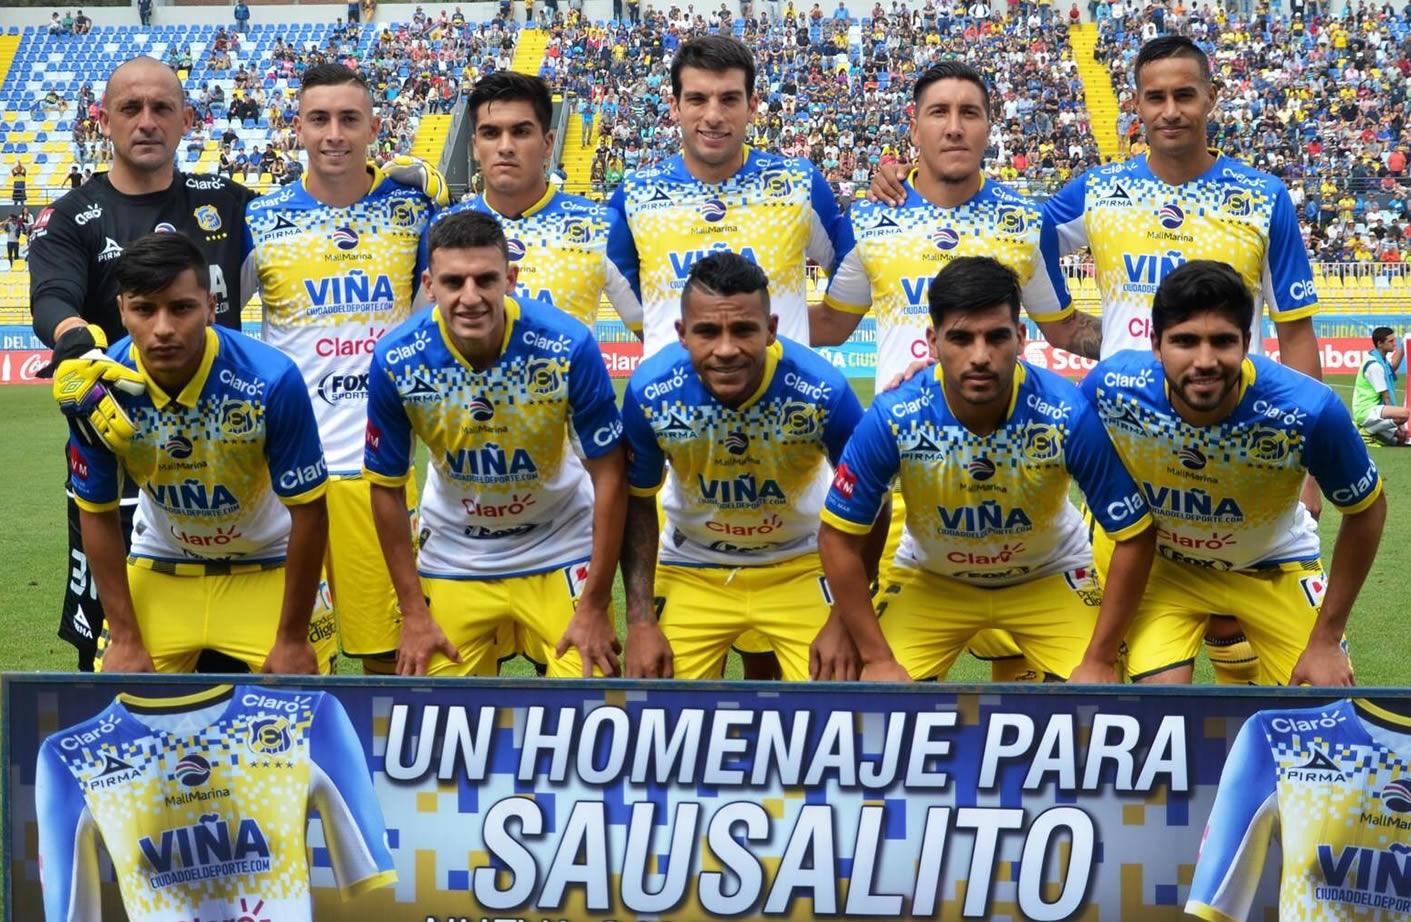 Camiseta homenaje al Sausalito | Foto Web Oficial